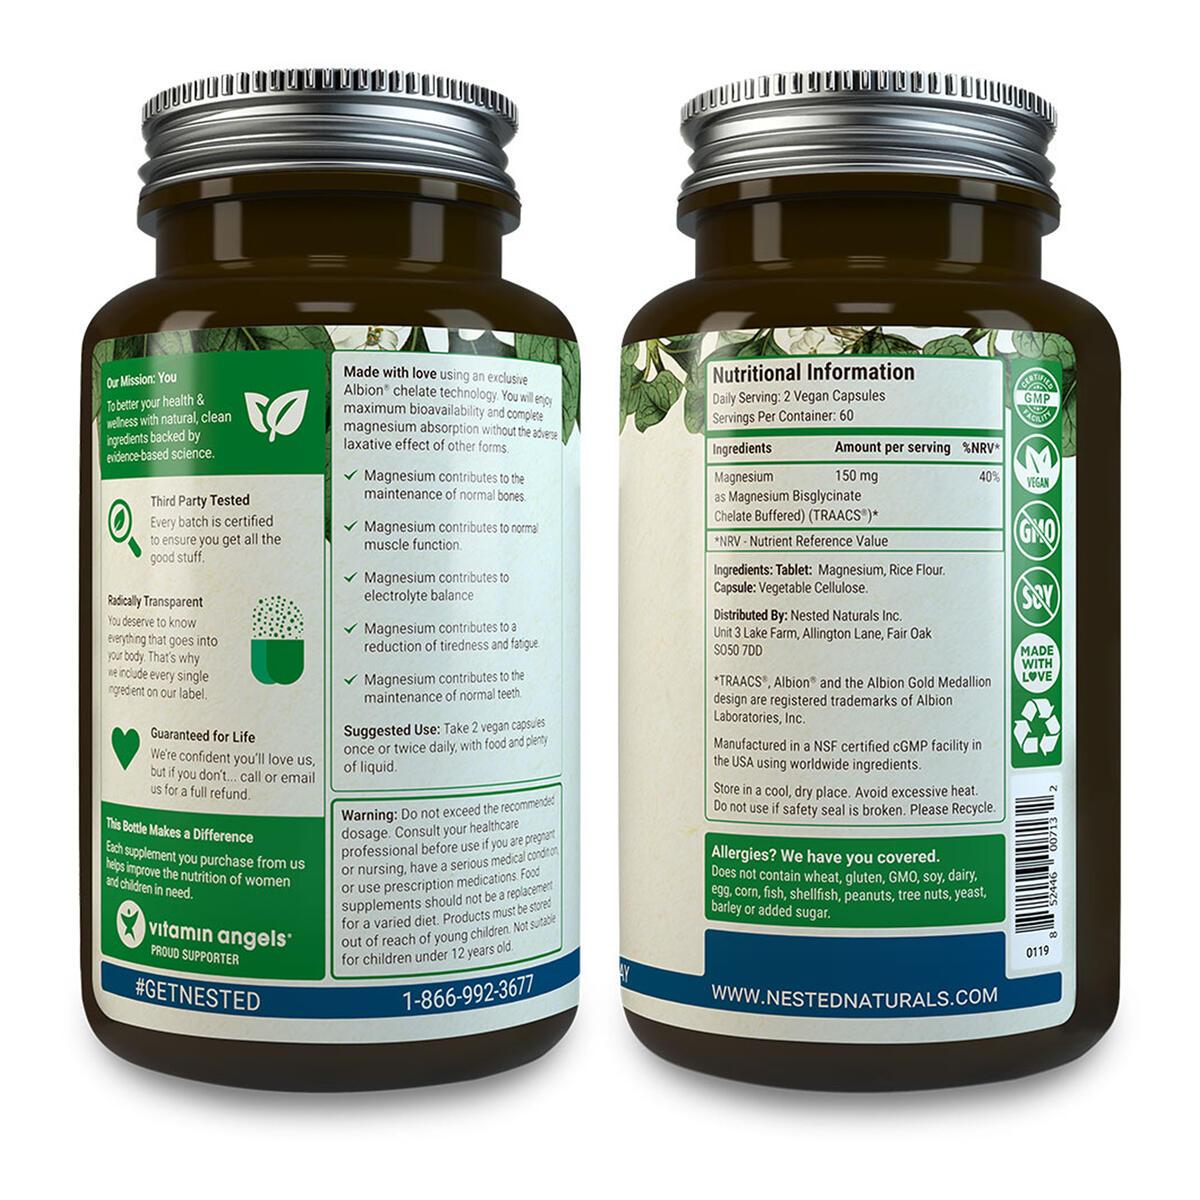 Nested Naturals Magnesium Glycinate (200 mg) | Vegan, Gluten-Free, Non-GMO